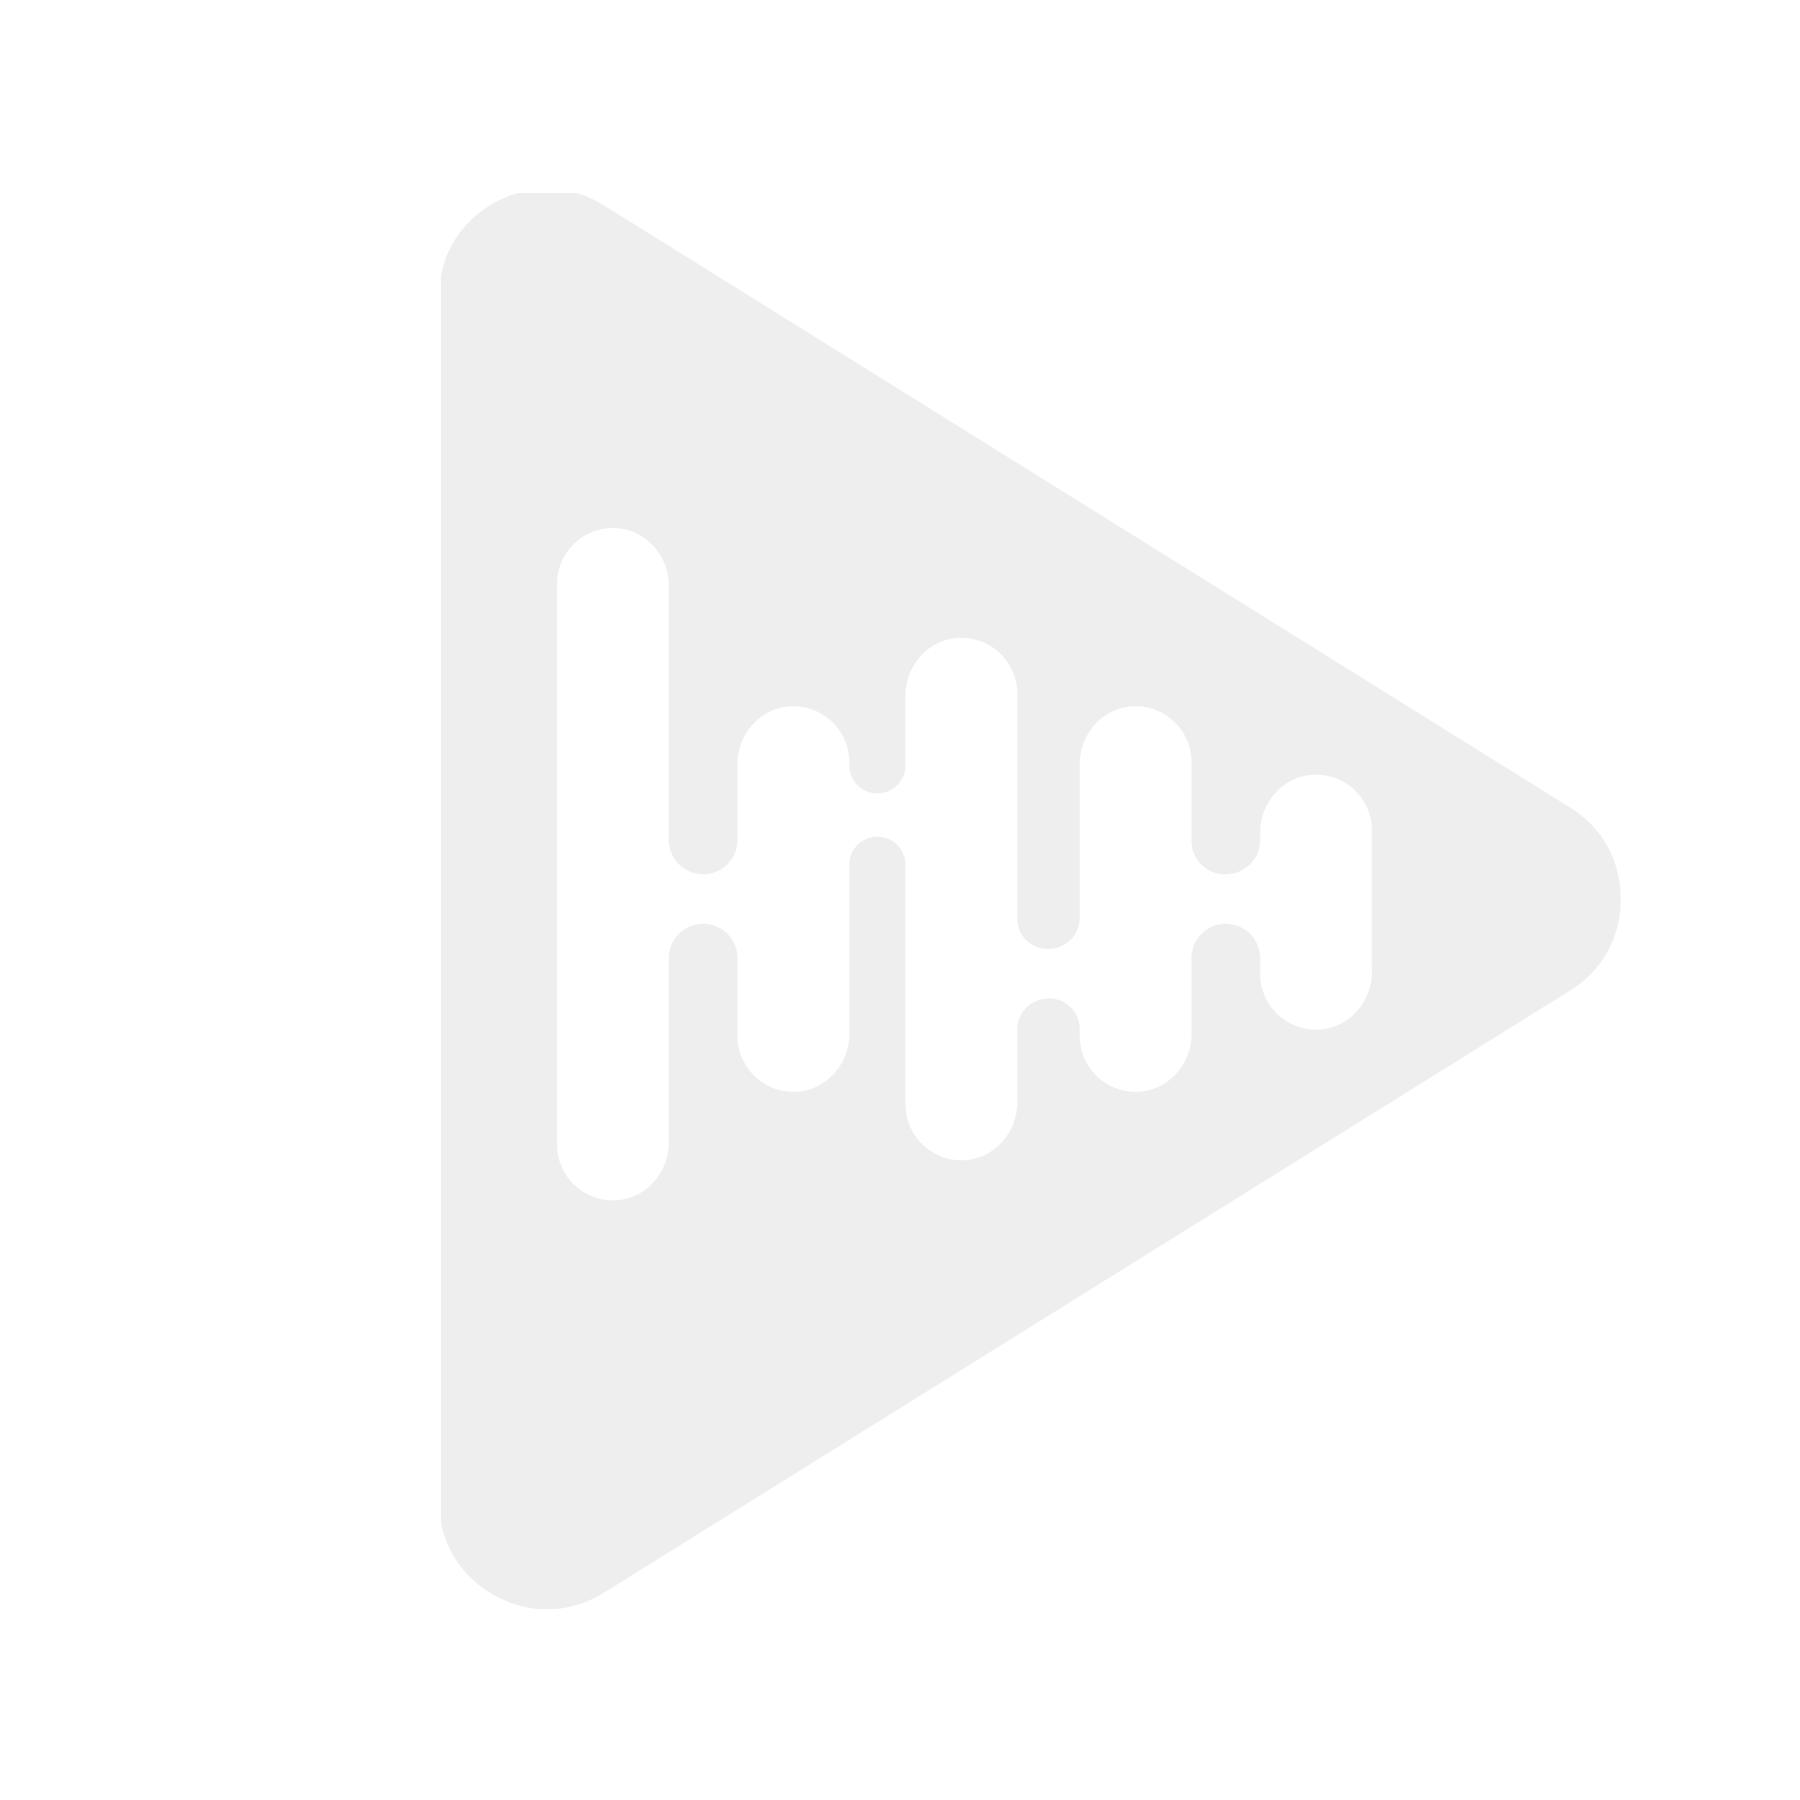 Speedsignal B-3474762